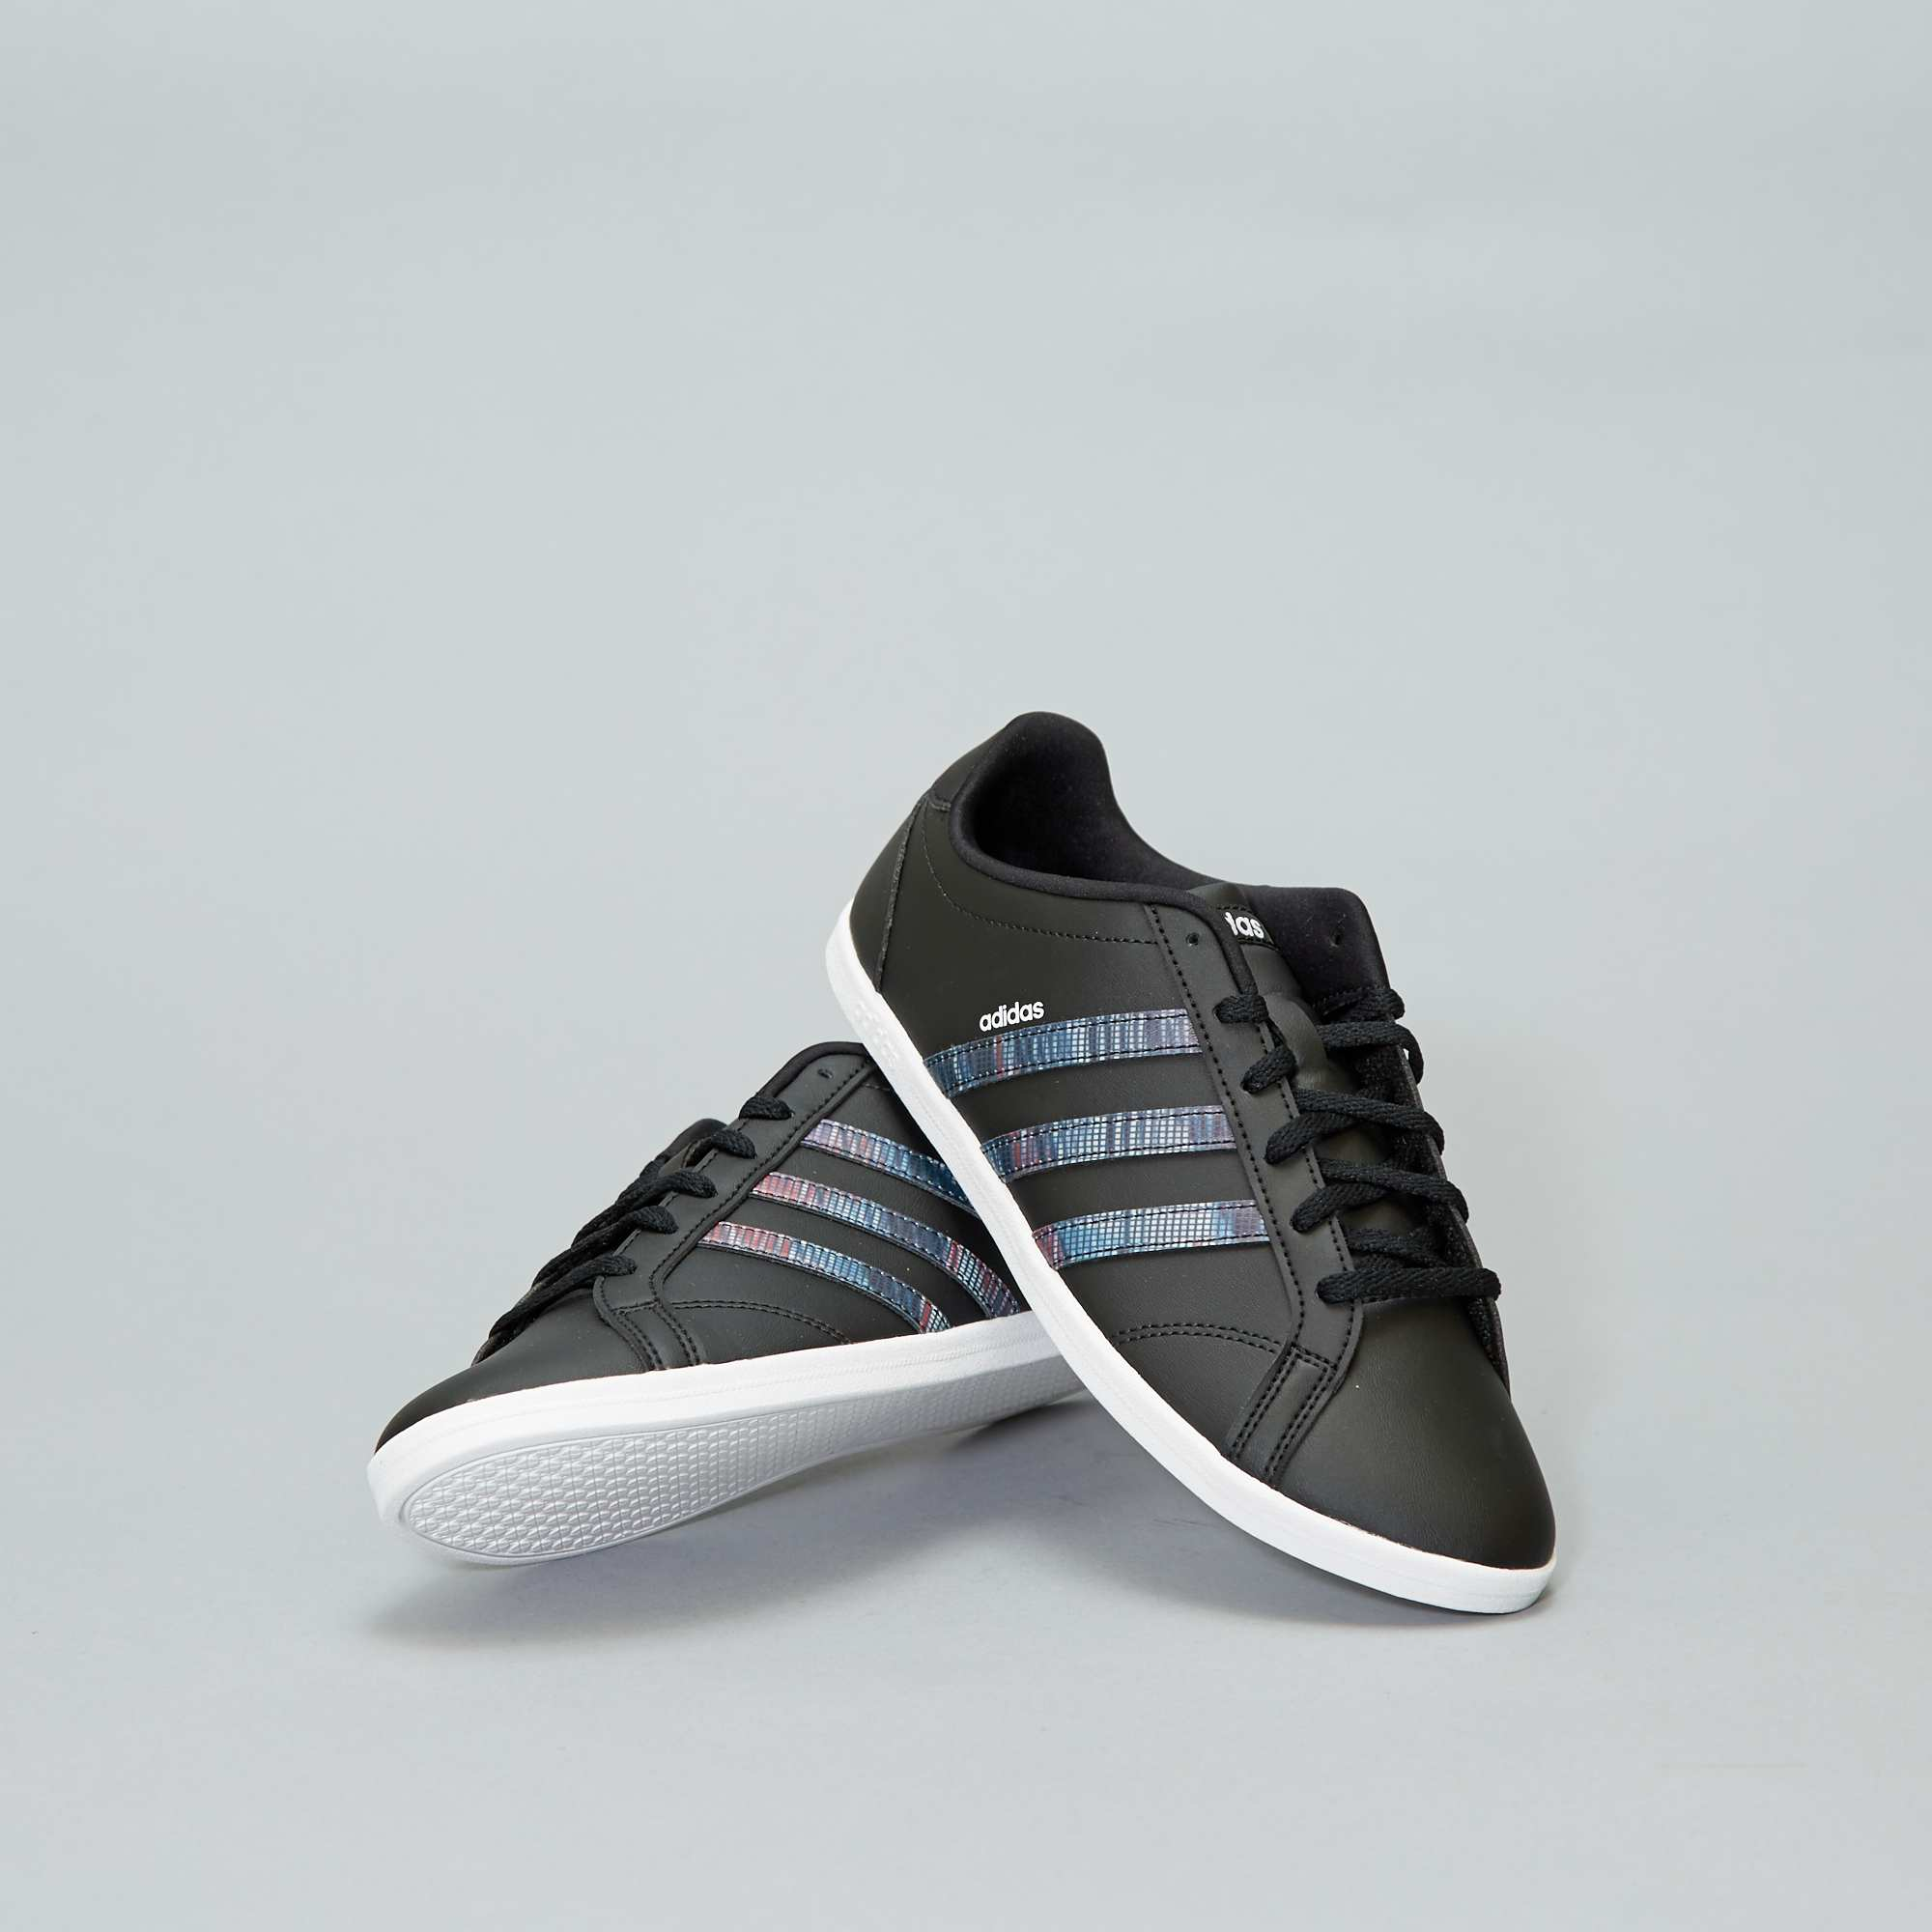 5104348b41a92b Baskets basses 'Adidas' 'Coneo QT' Femme - NOIR - Kiabi - 33,00€